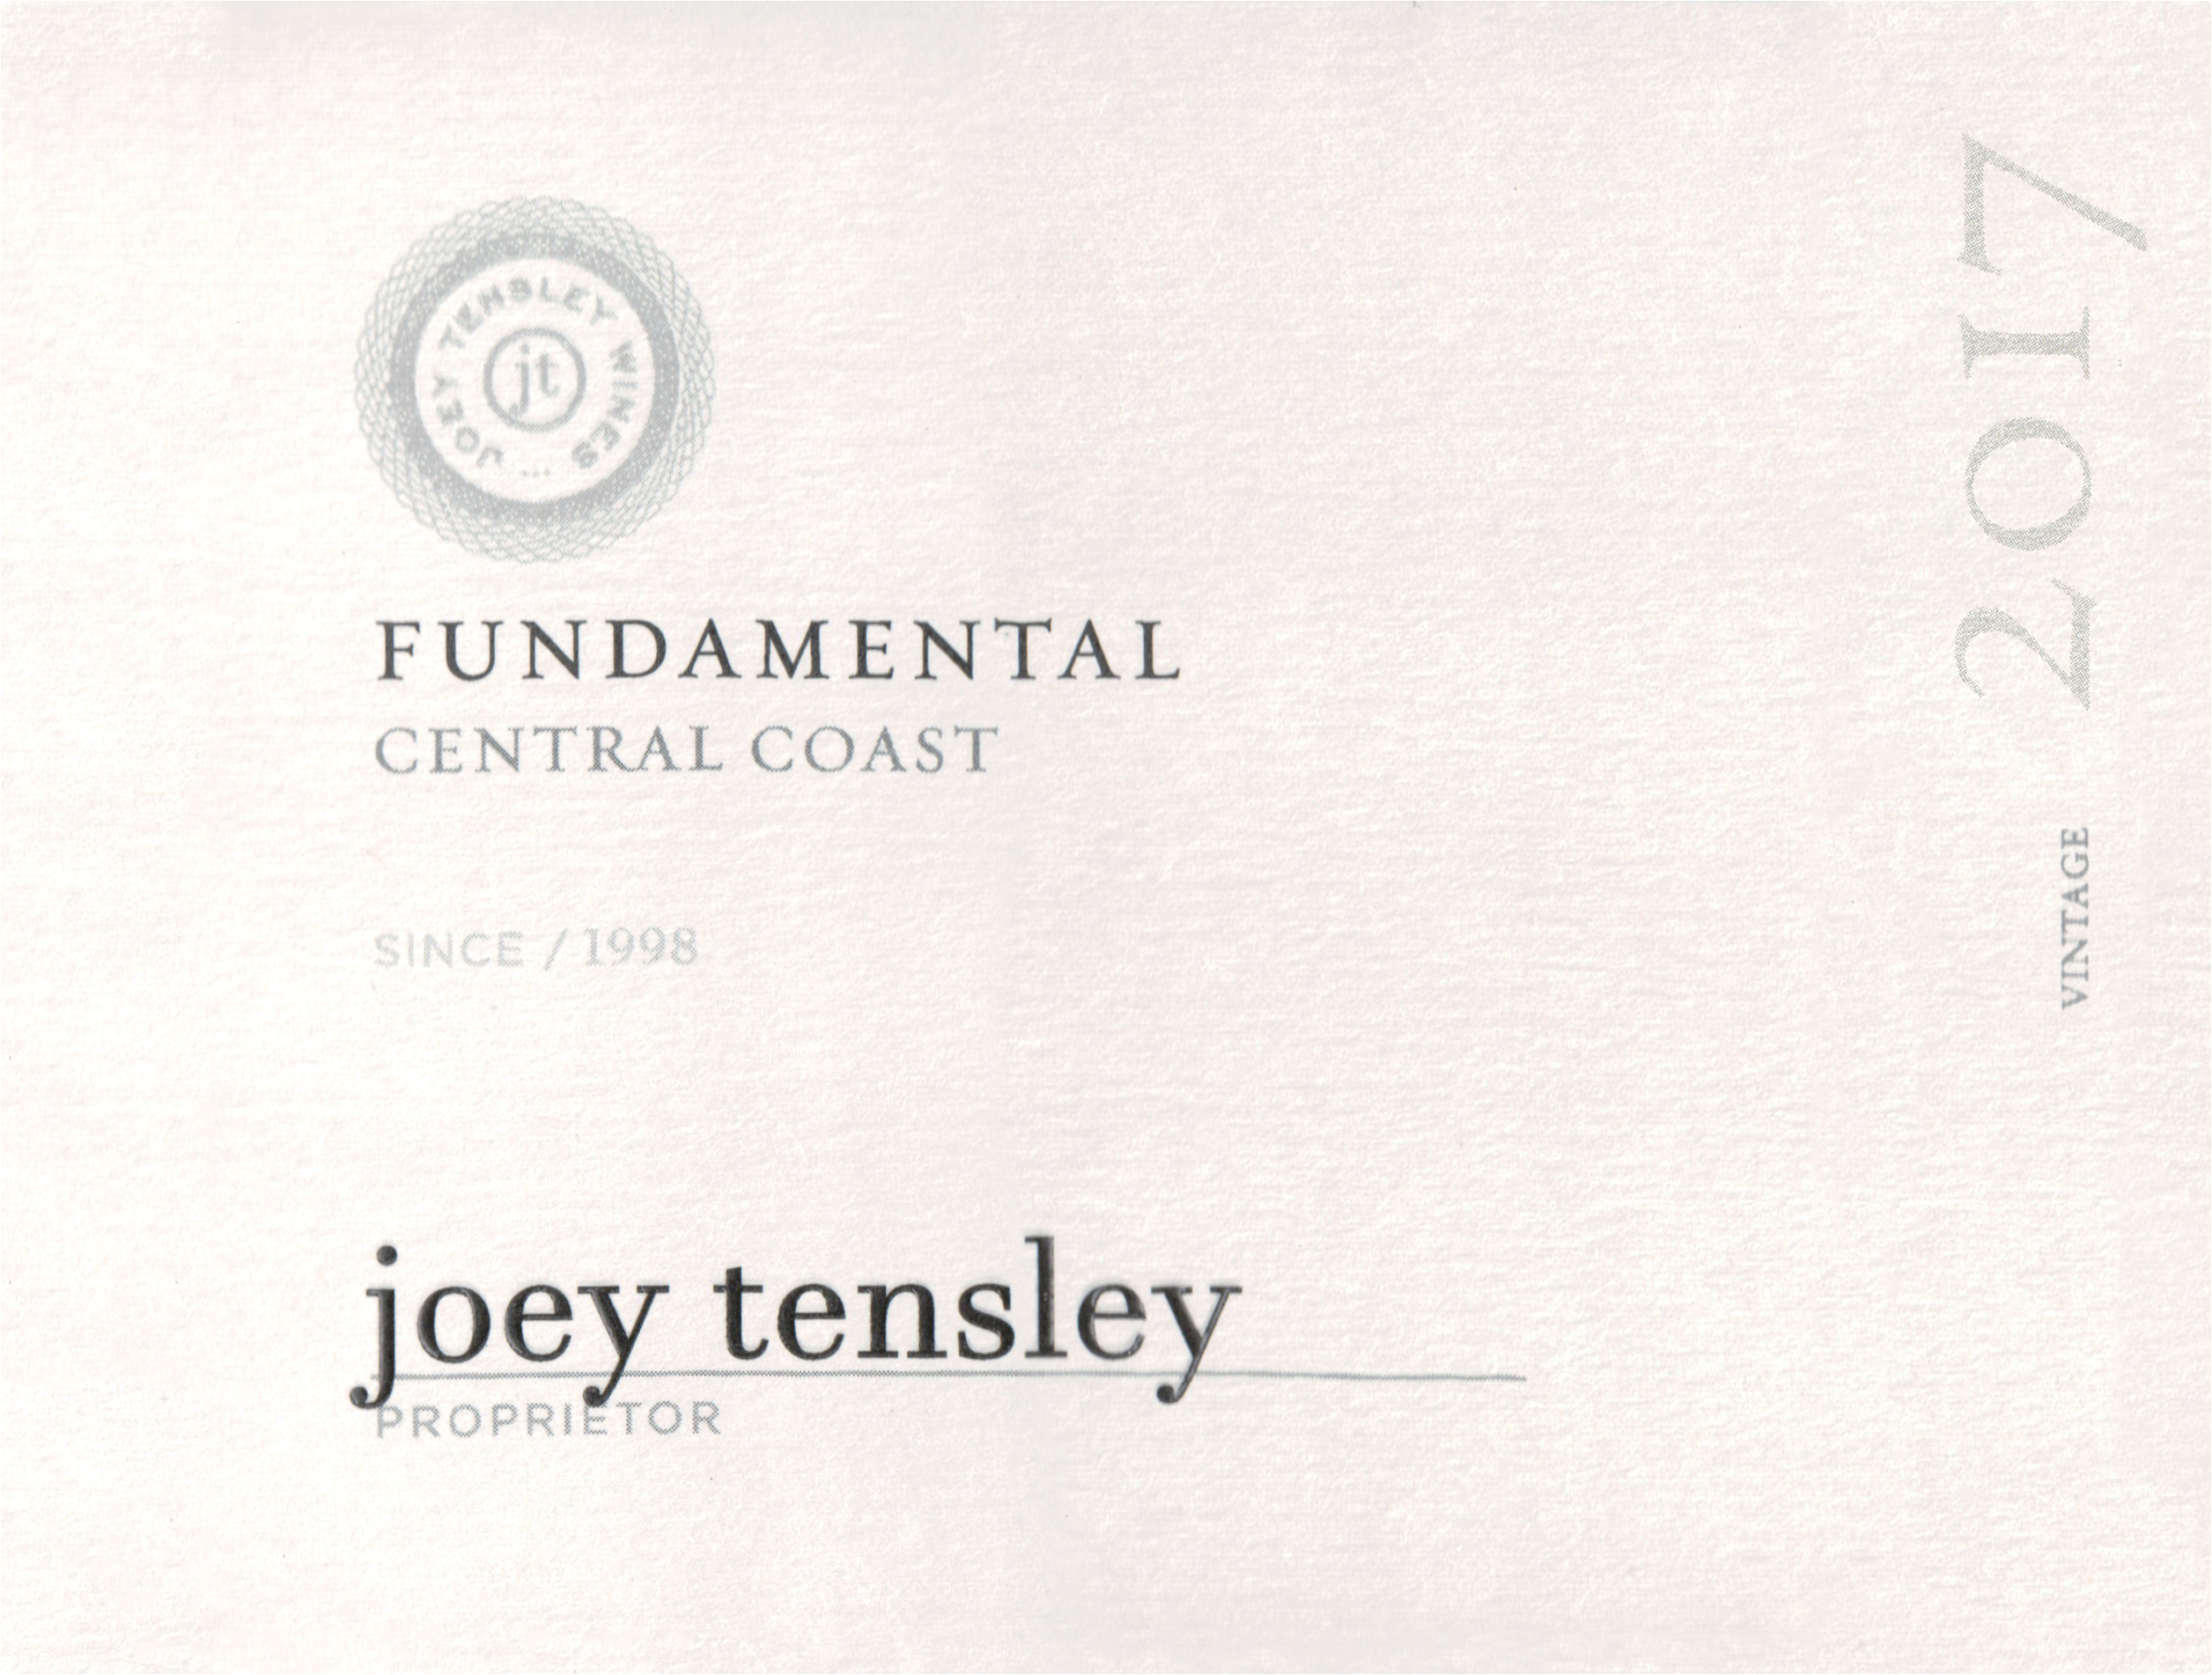 Joey Tensley Fundamental Red Blend Central Coast 2017